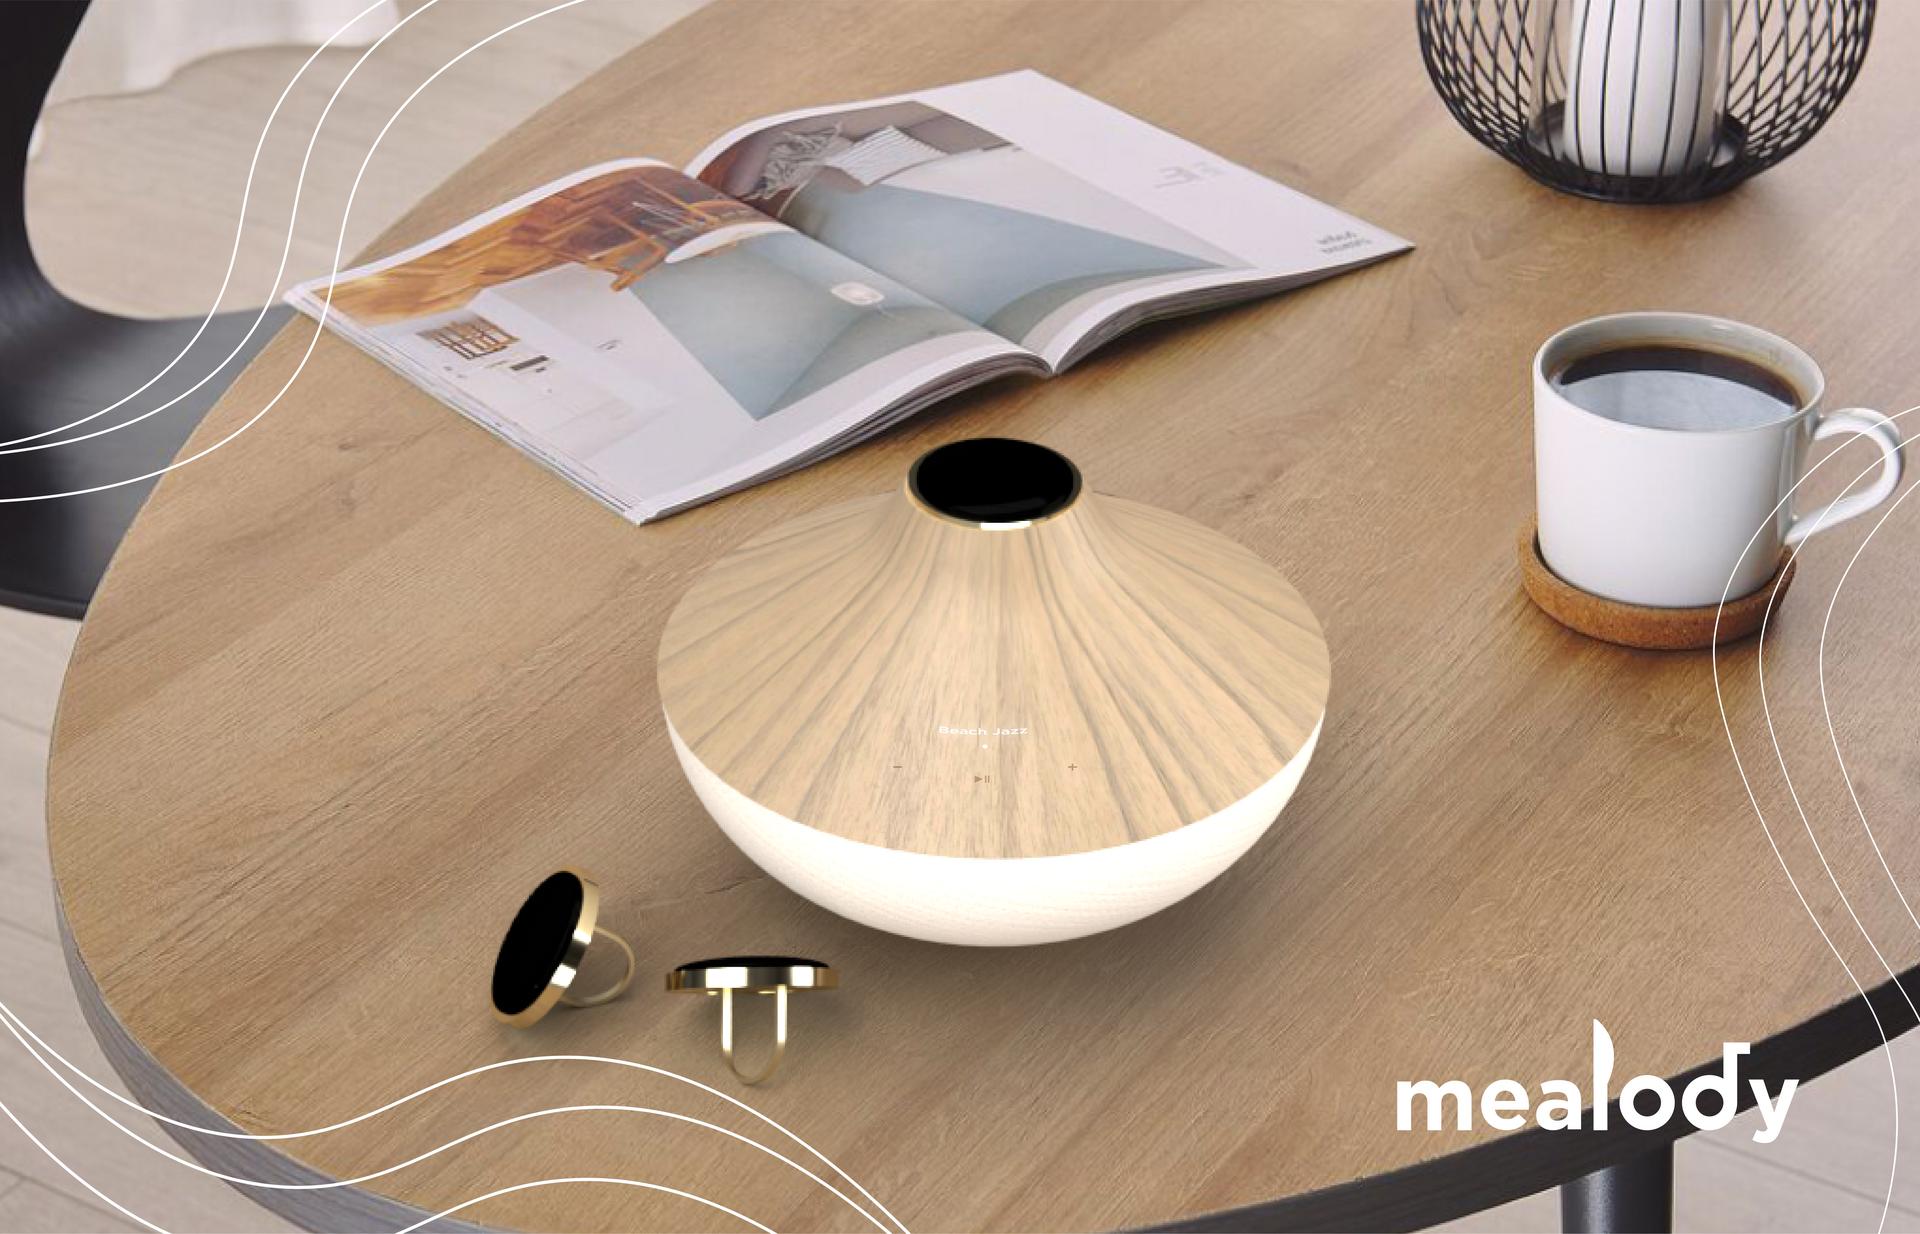 Mealody Audio Speaker